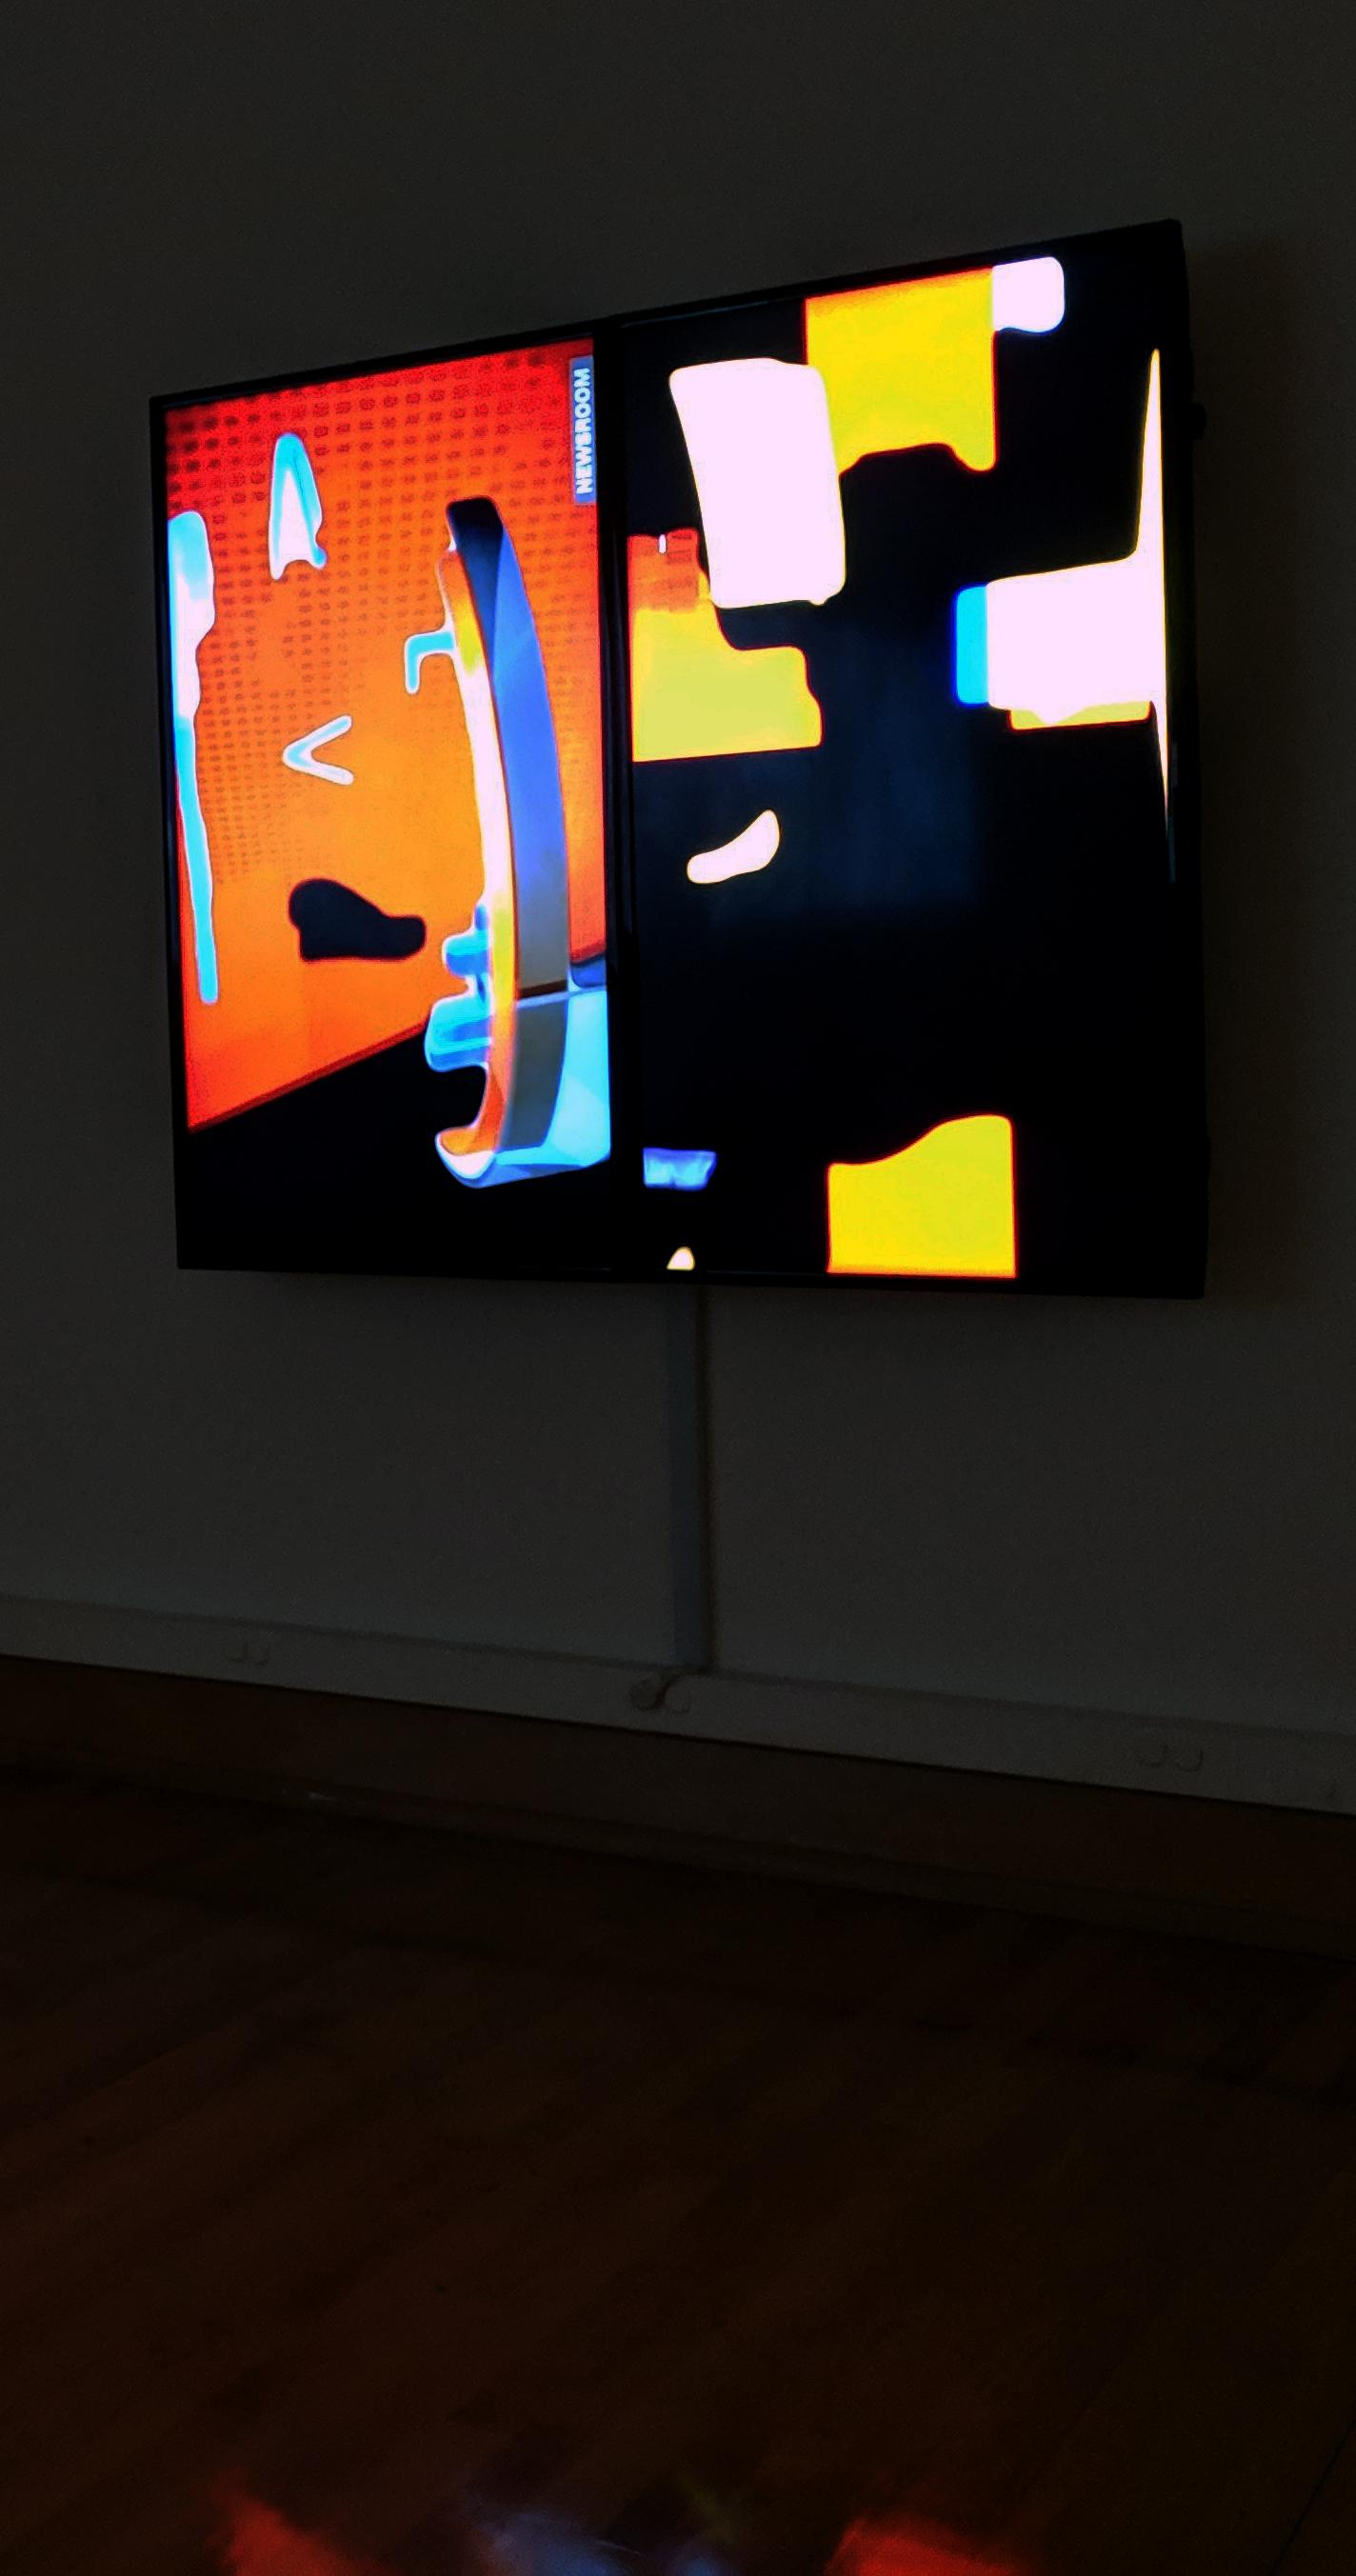 Breaking (Slow News) , 2019, Installation view, Wasmer Gallery, FGCU